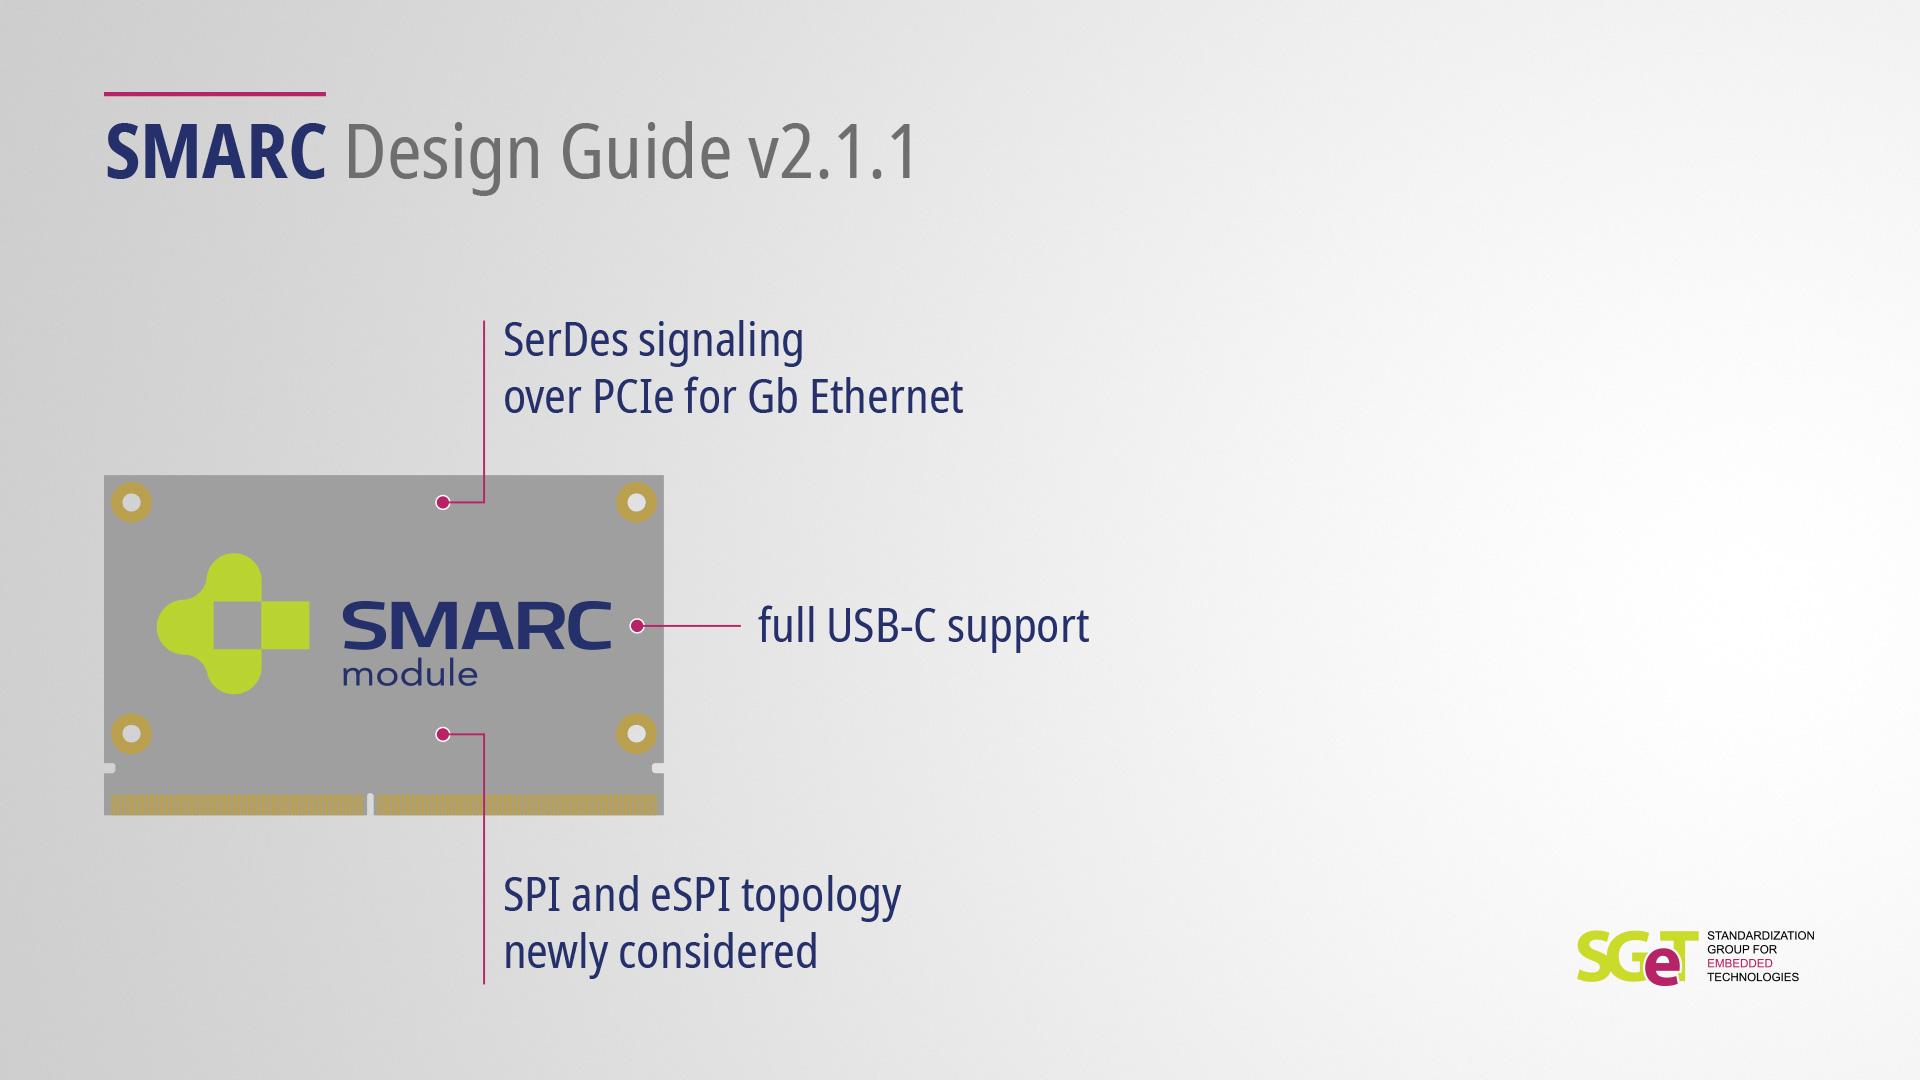 SMARC Design Guide v2.1.1 released